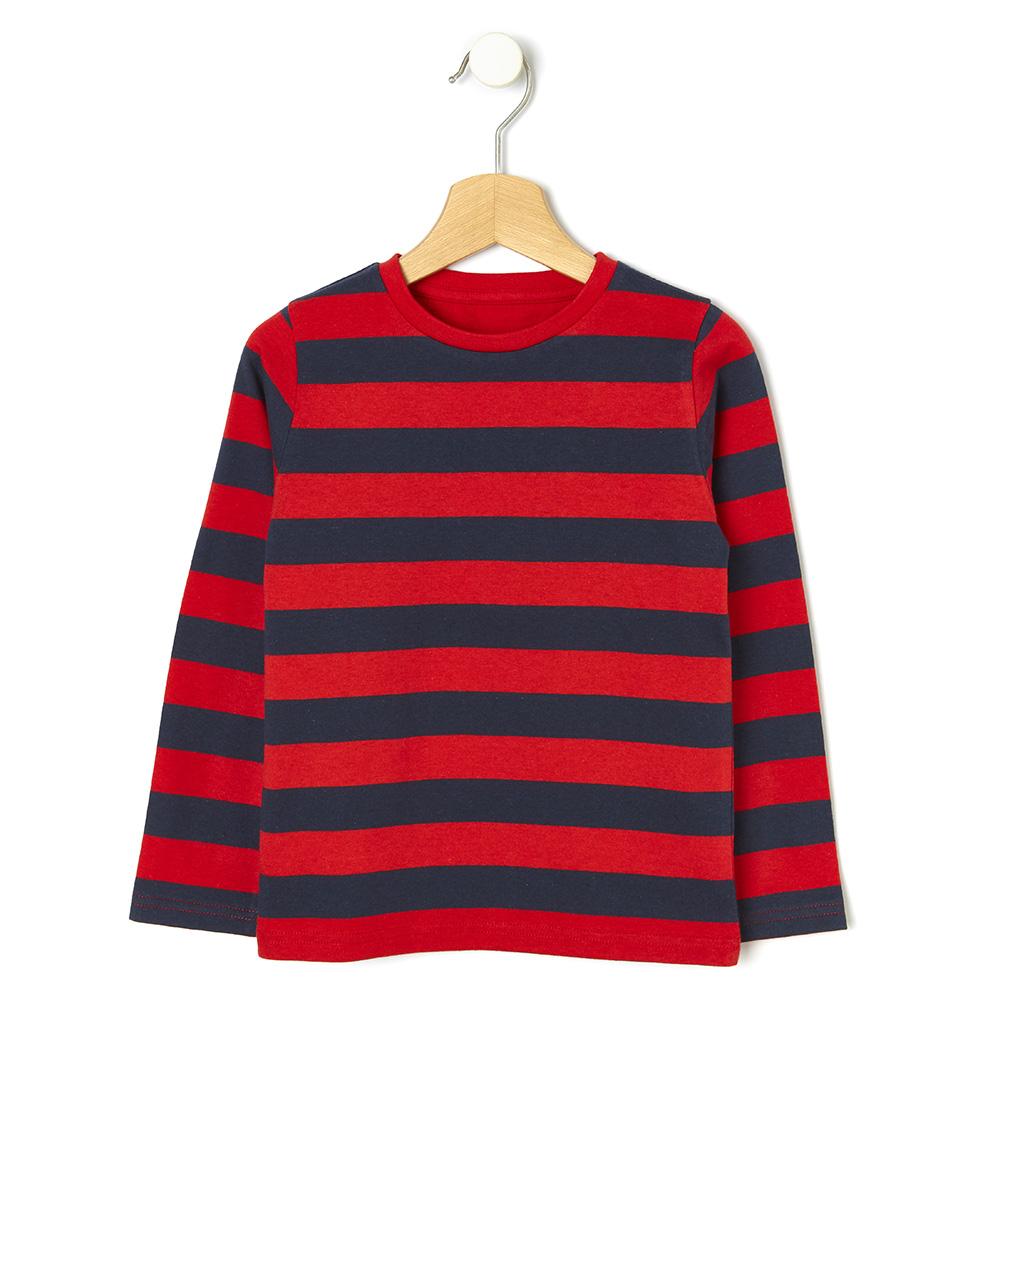 T-shirt με Ρίγες  Μεγ.8-/9-10 ετών για Αγόρι